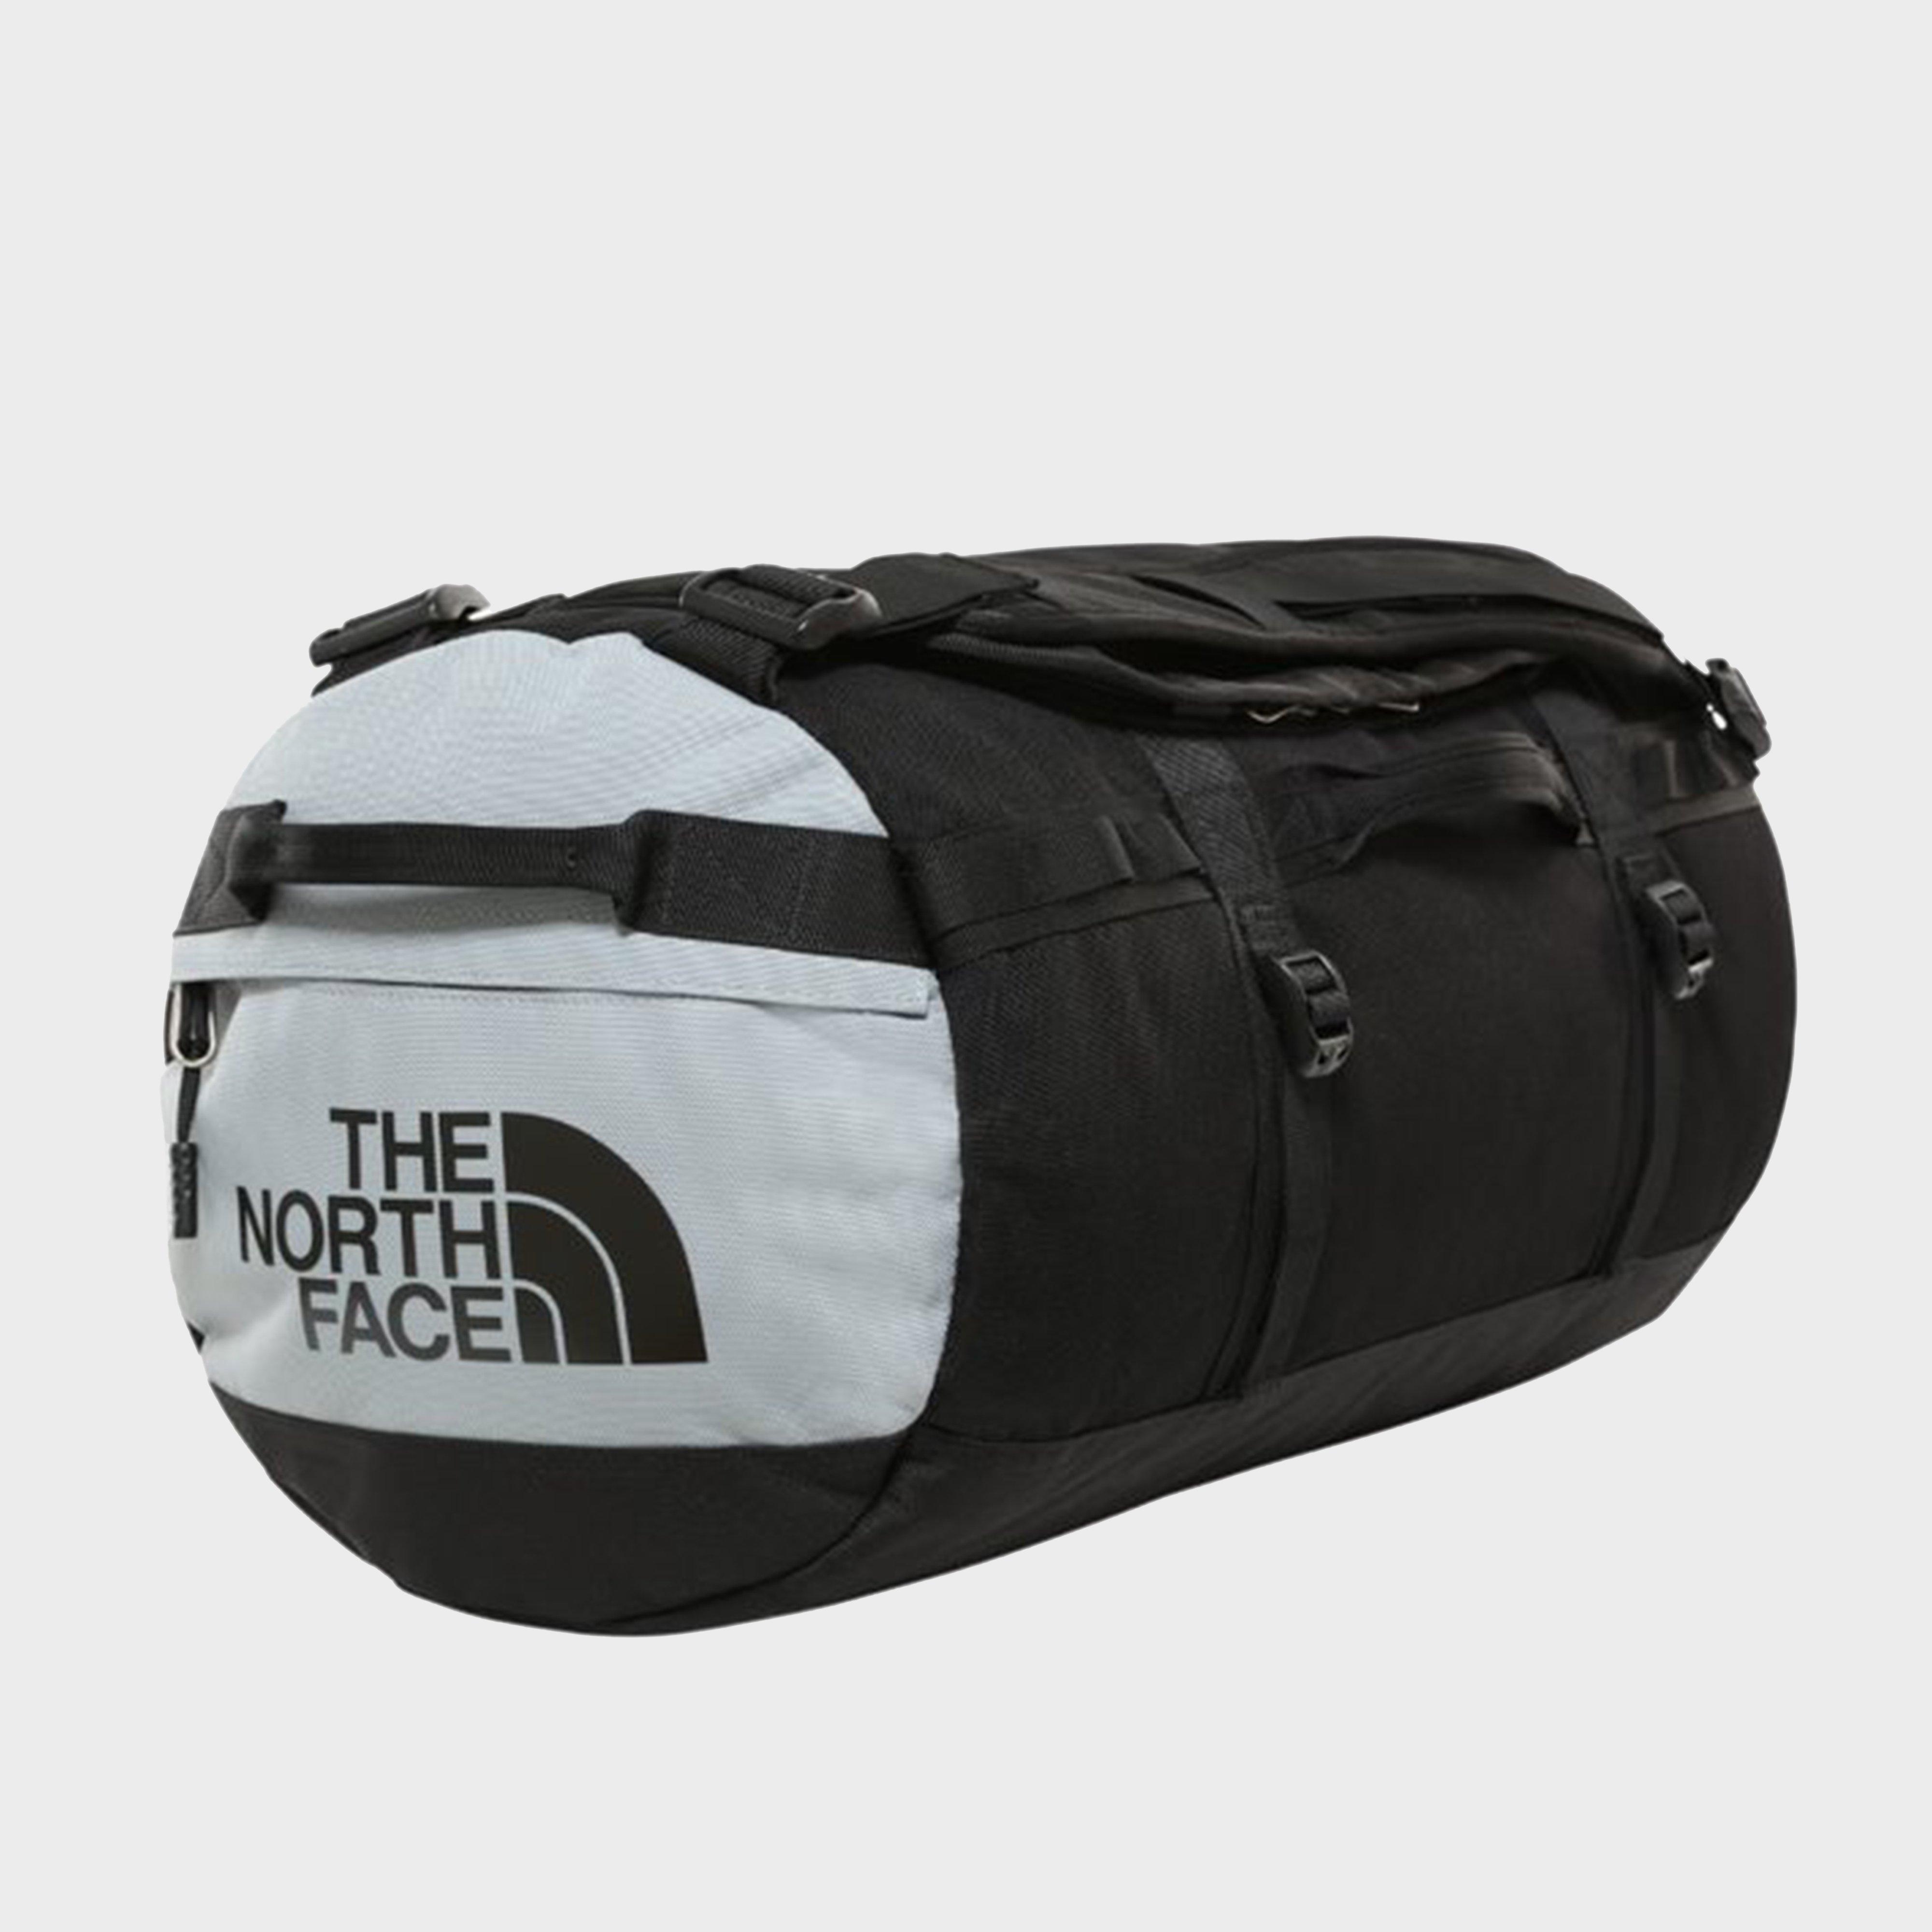 The North Face Gilman Duffel Bag (Small) - Grey, Grey